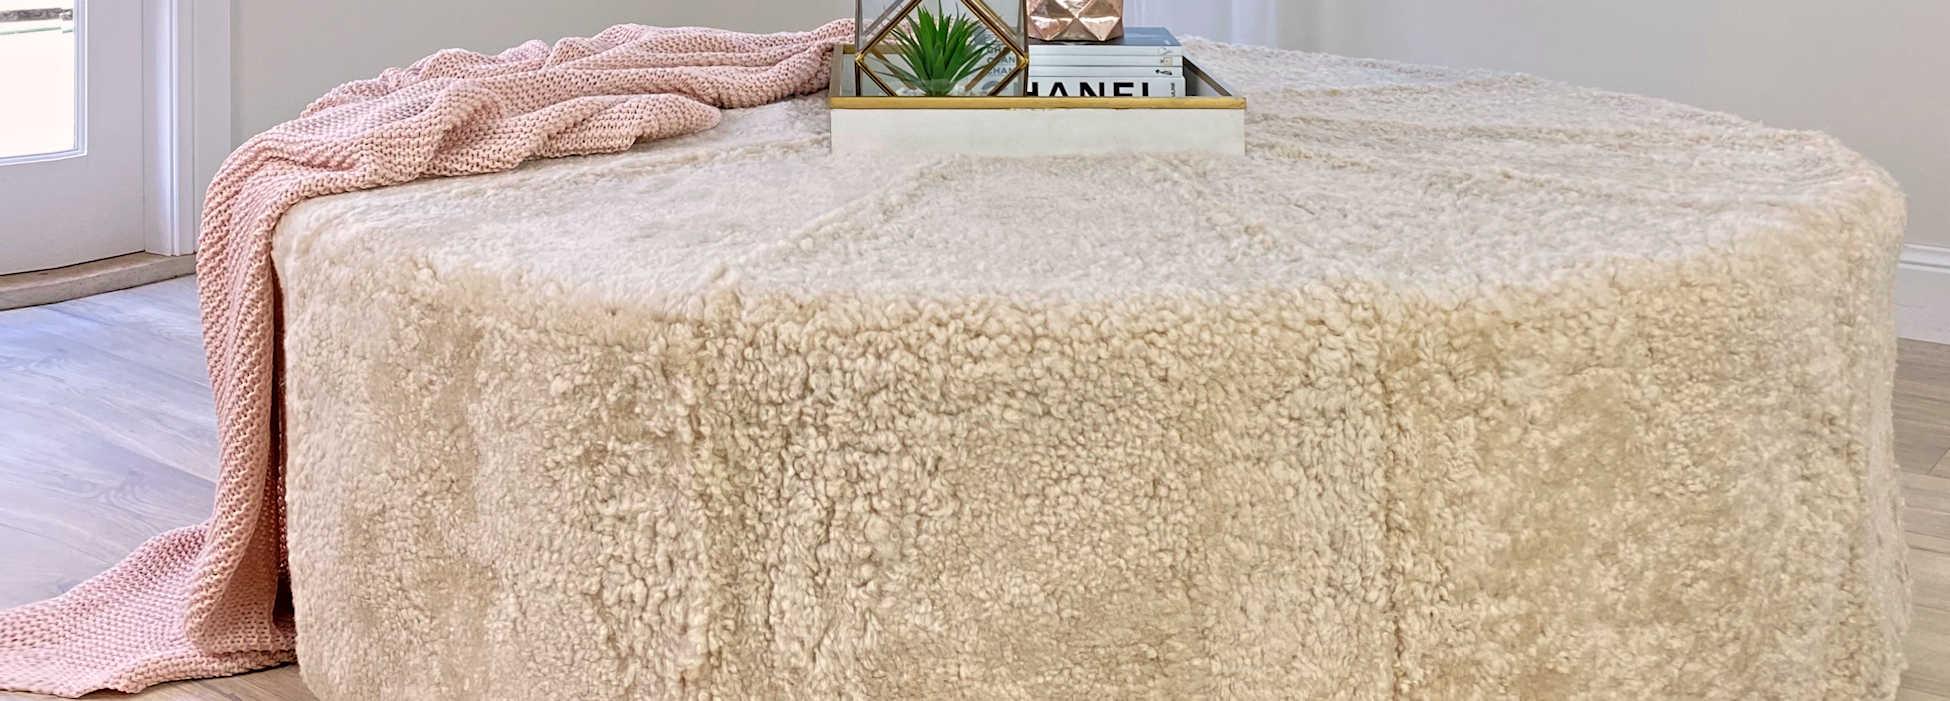 sheepskin rugs australia